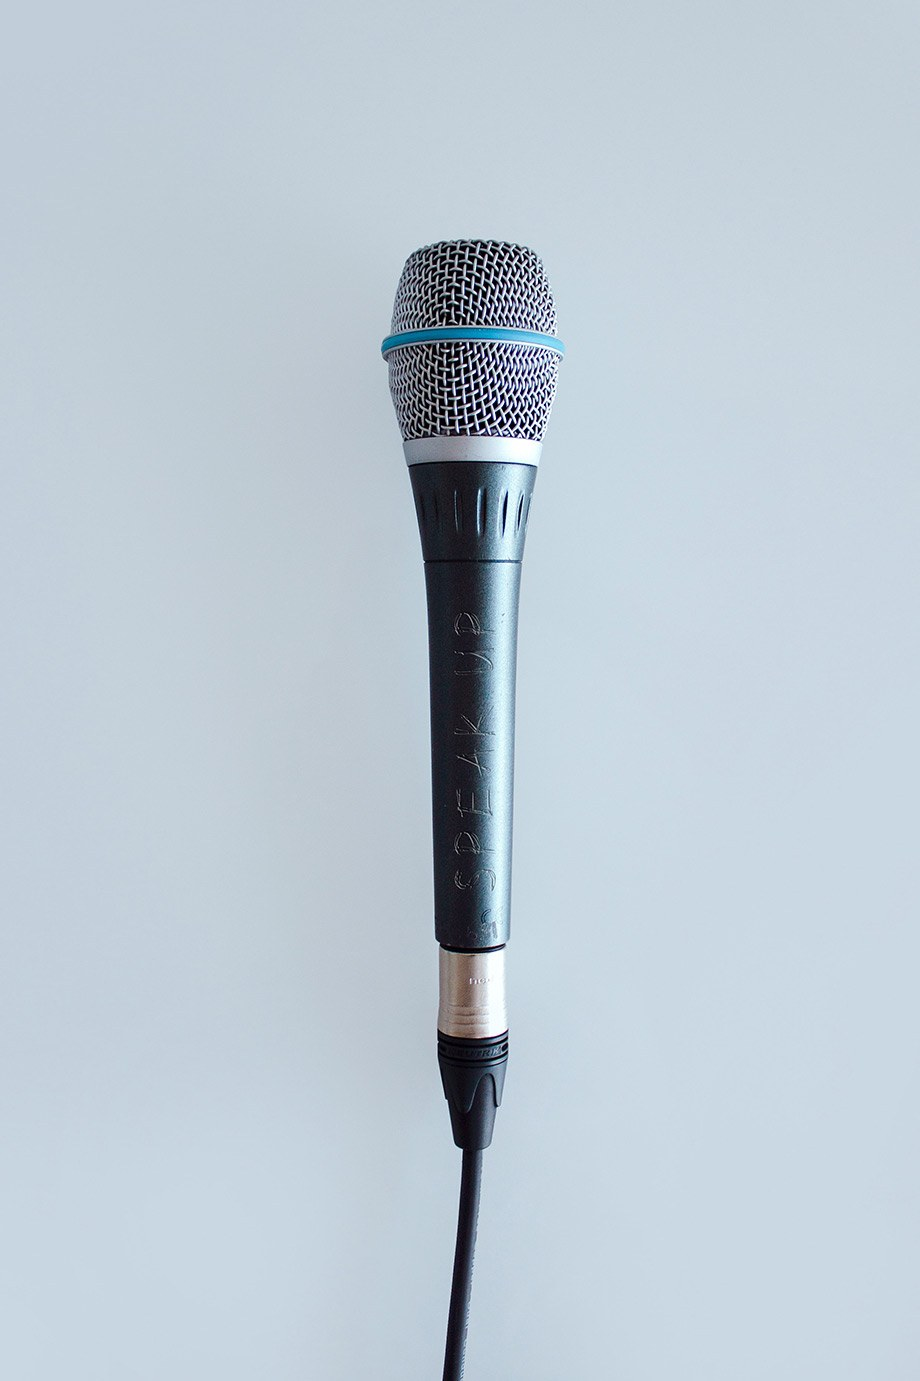 Gesang, Mikrofon (Hochformat)